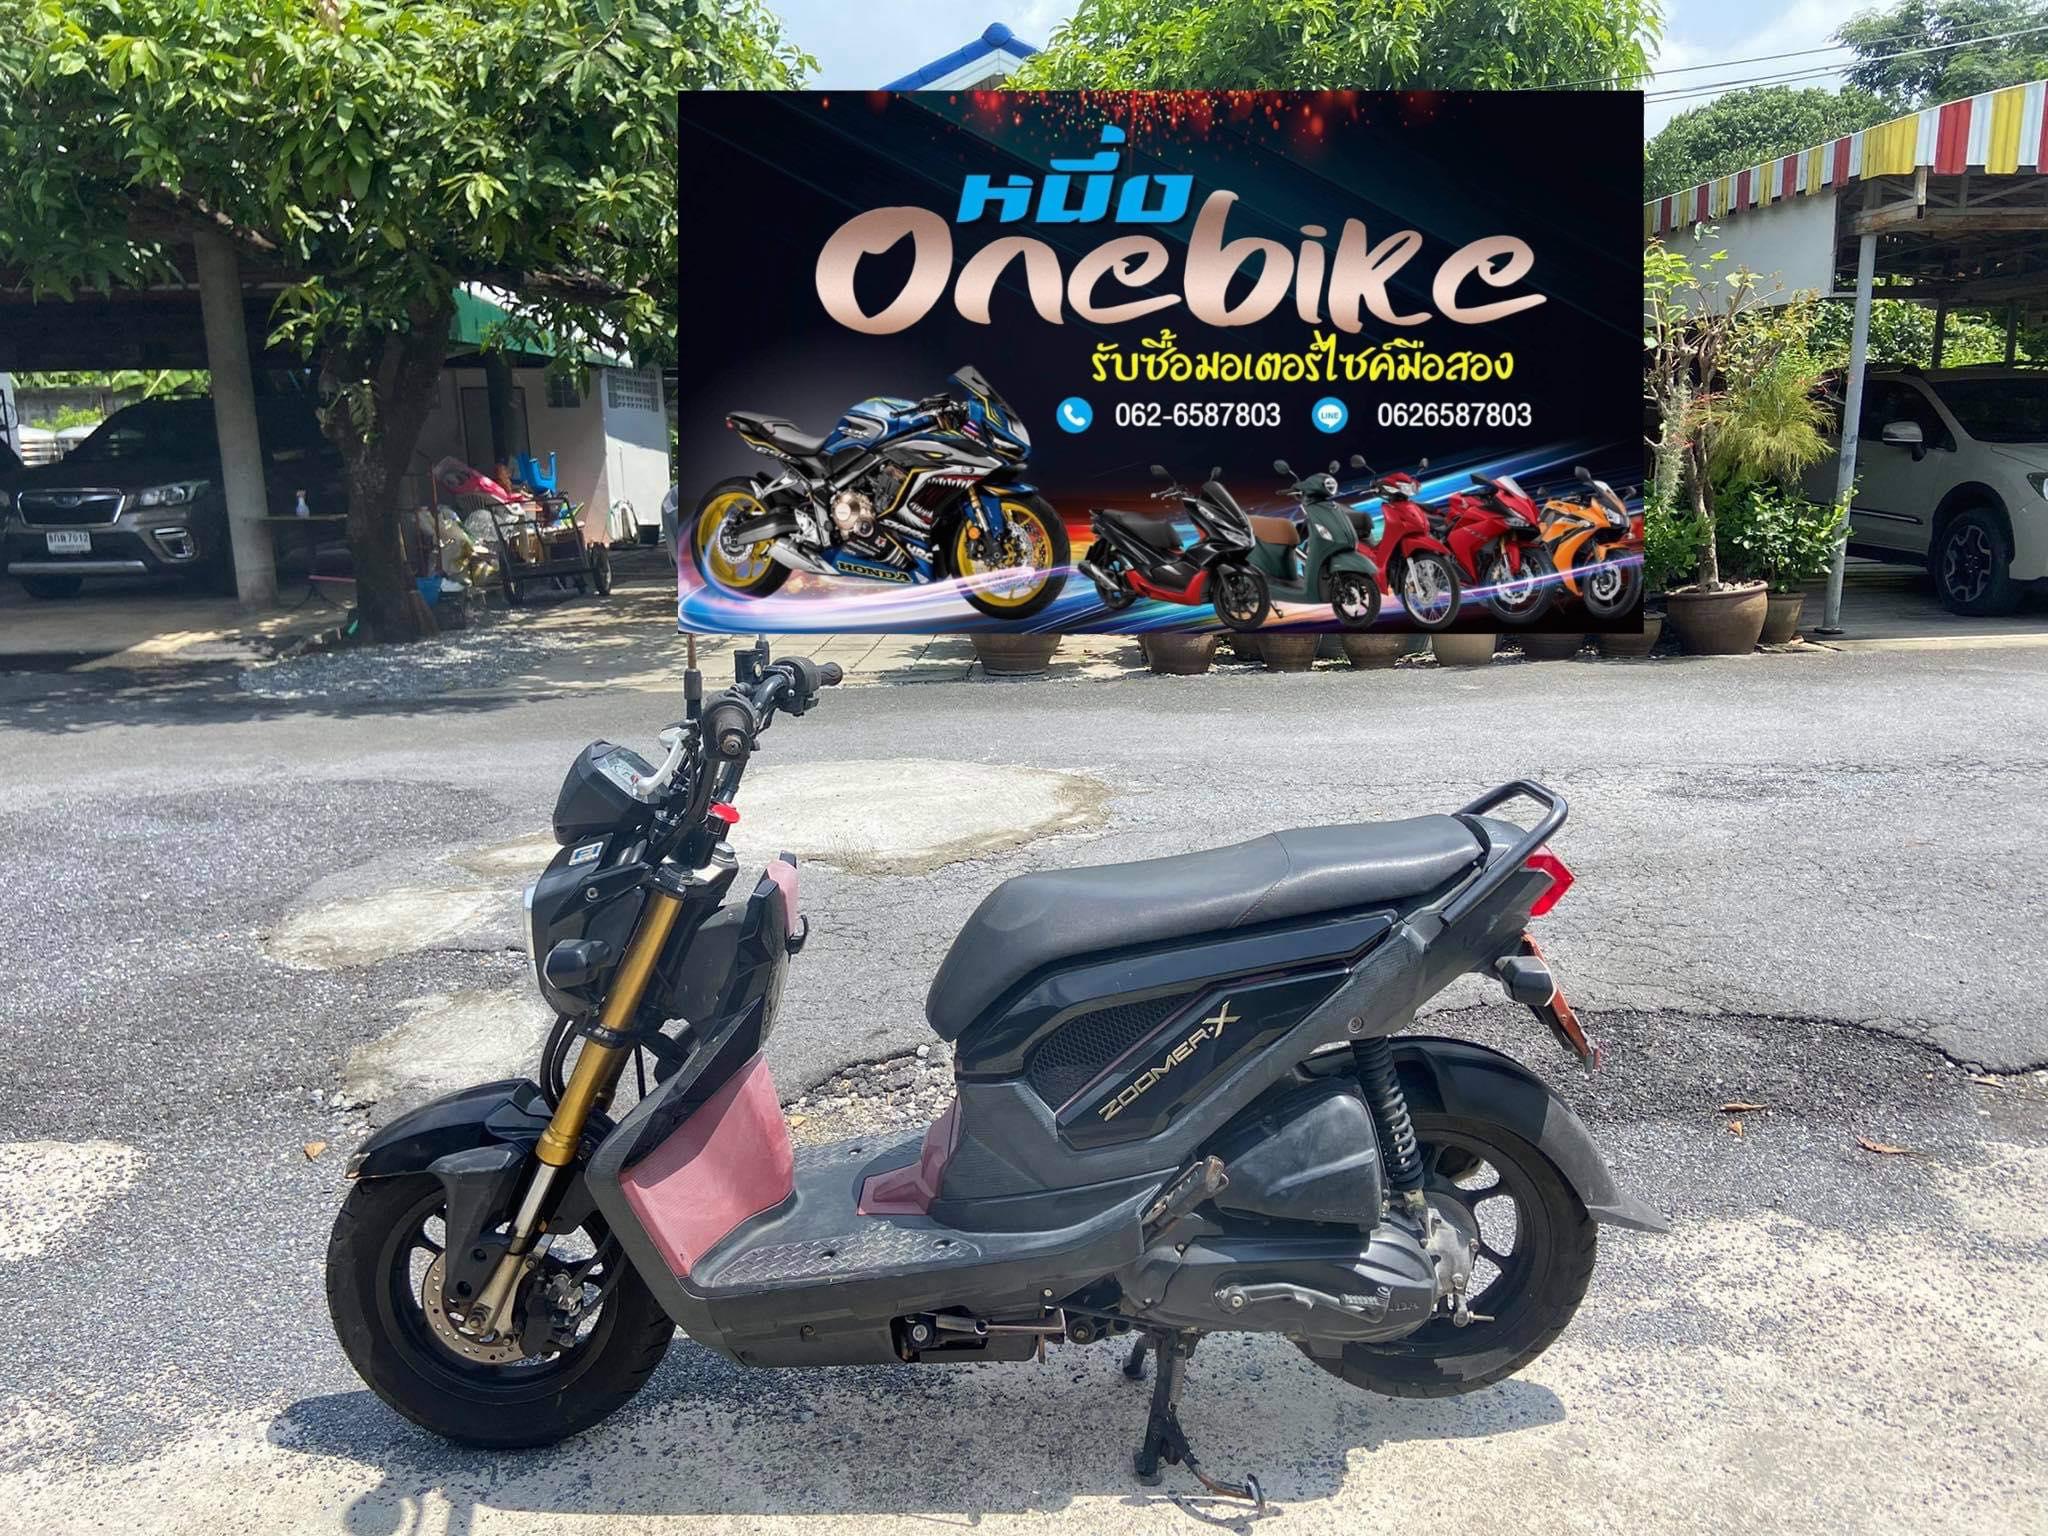 ONEBIKE รับซื้อรถมอเตอร์ไซค์บางขุนเทียน